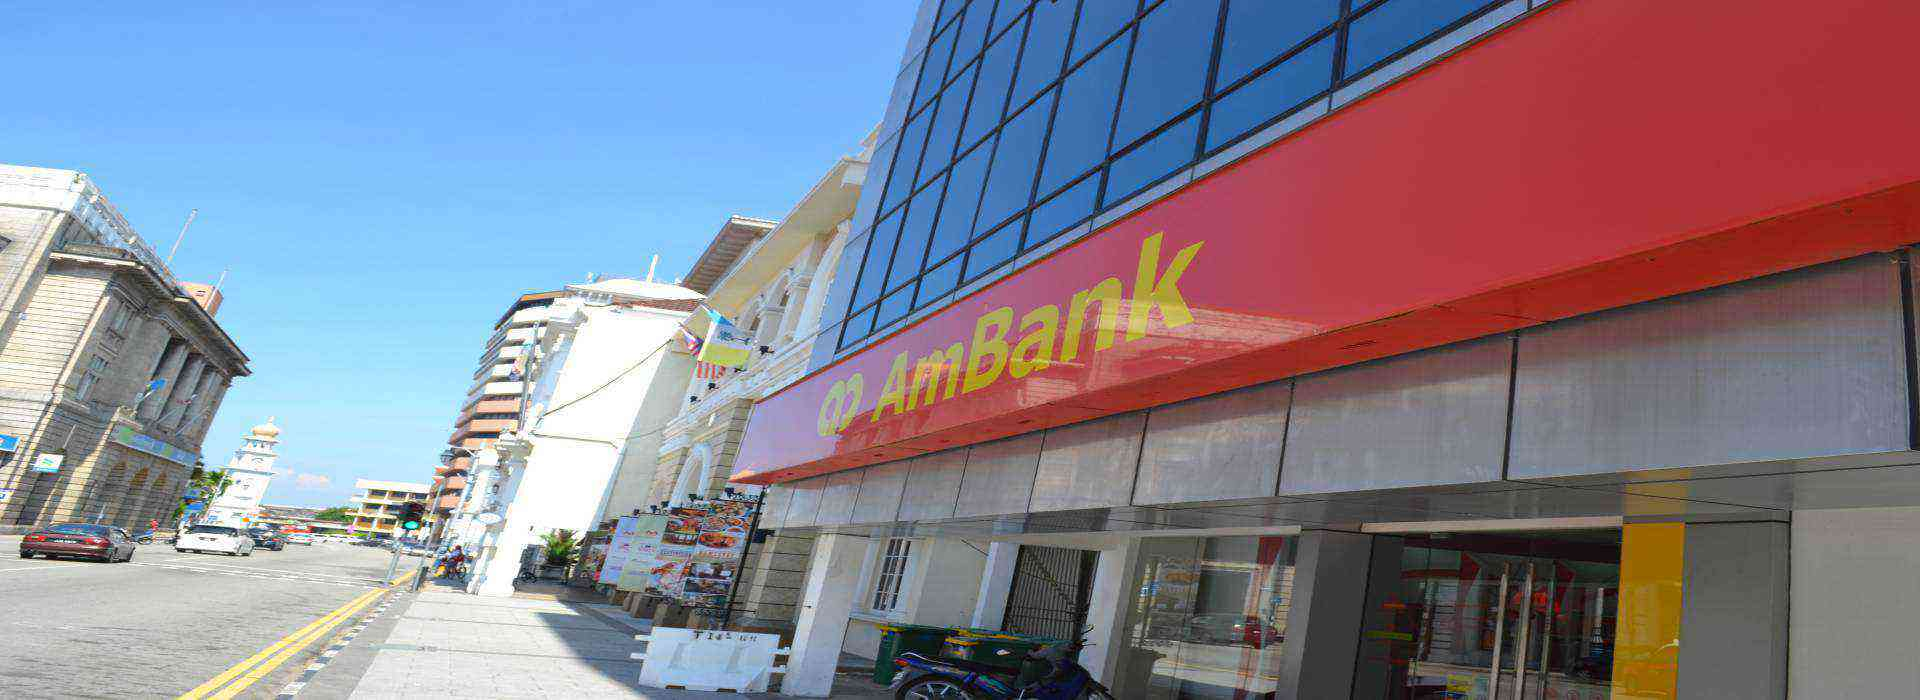 Ambank Malaysia Customer Service Number Email Support Address